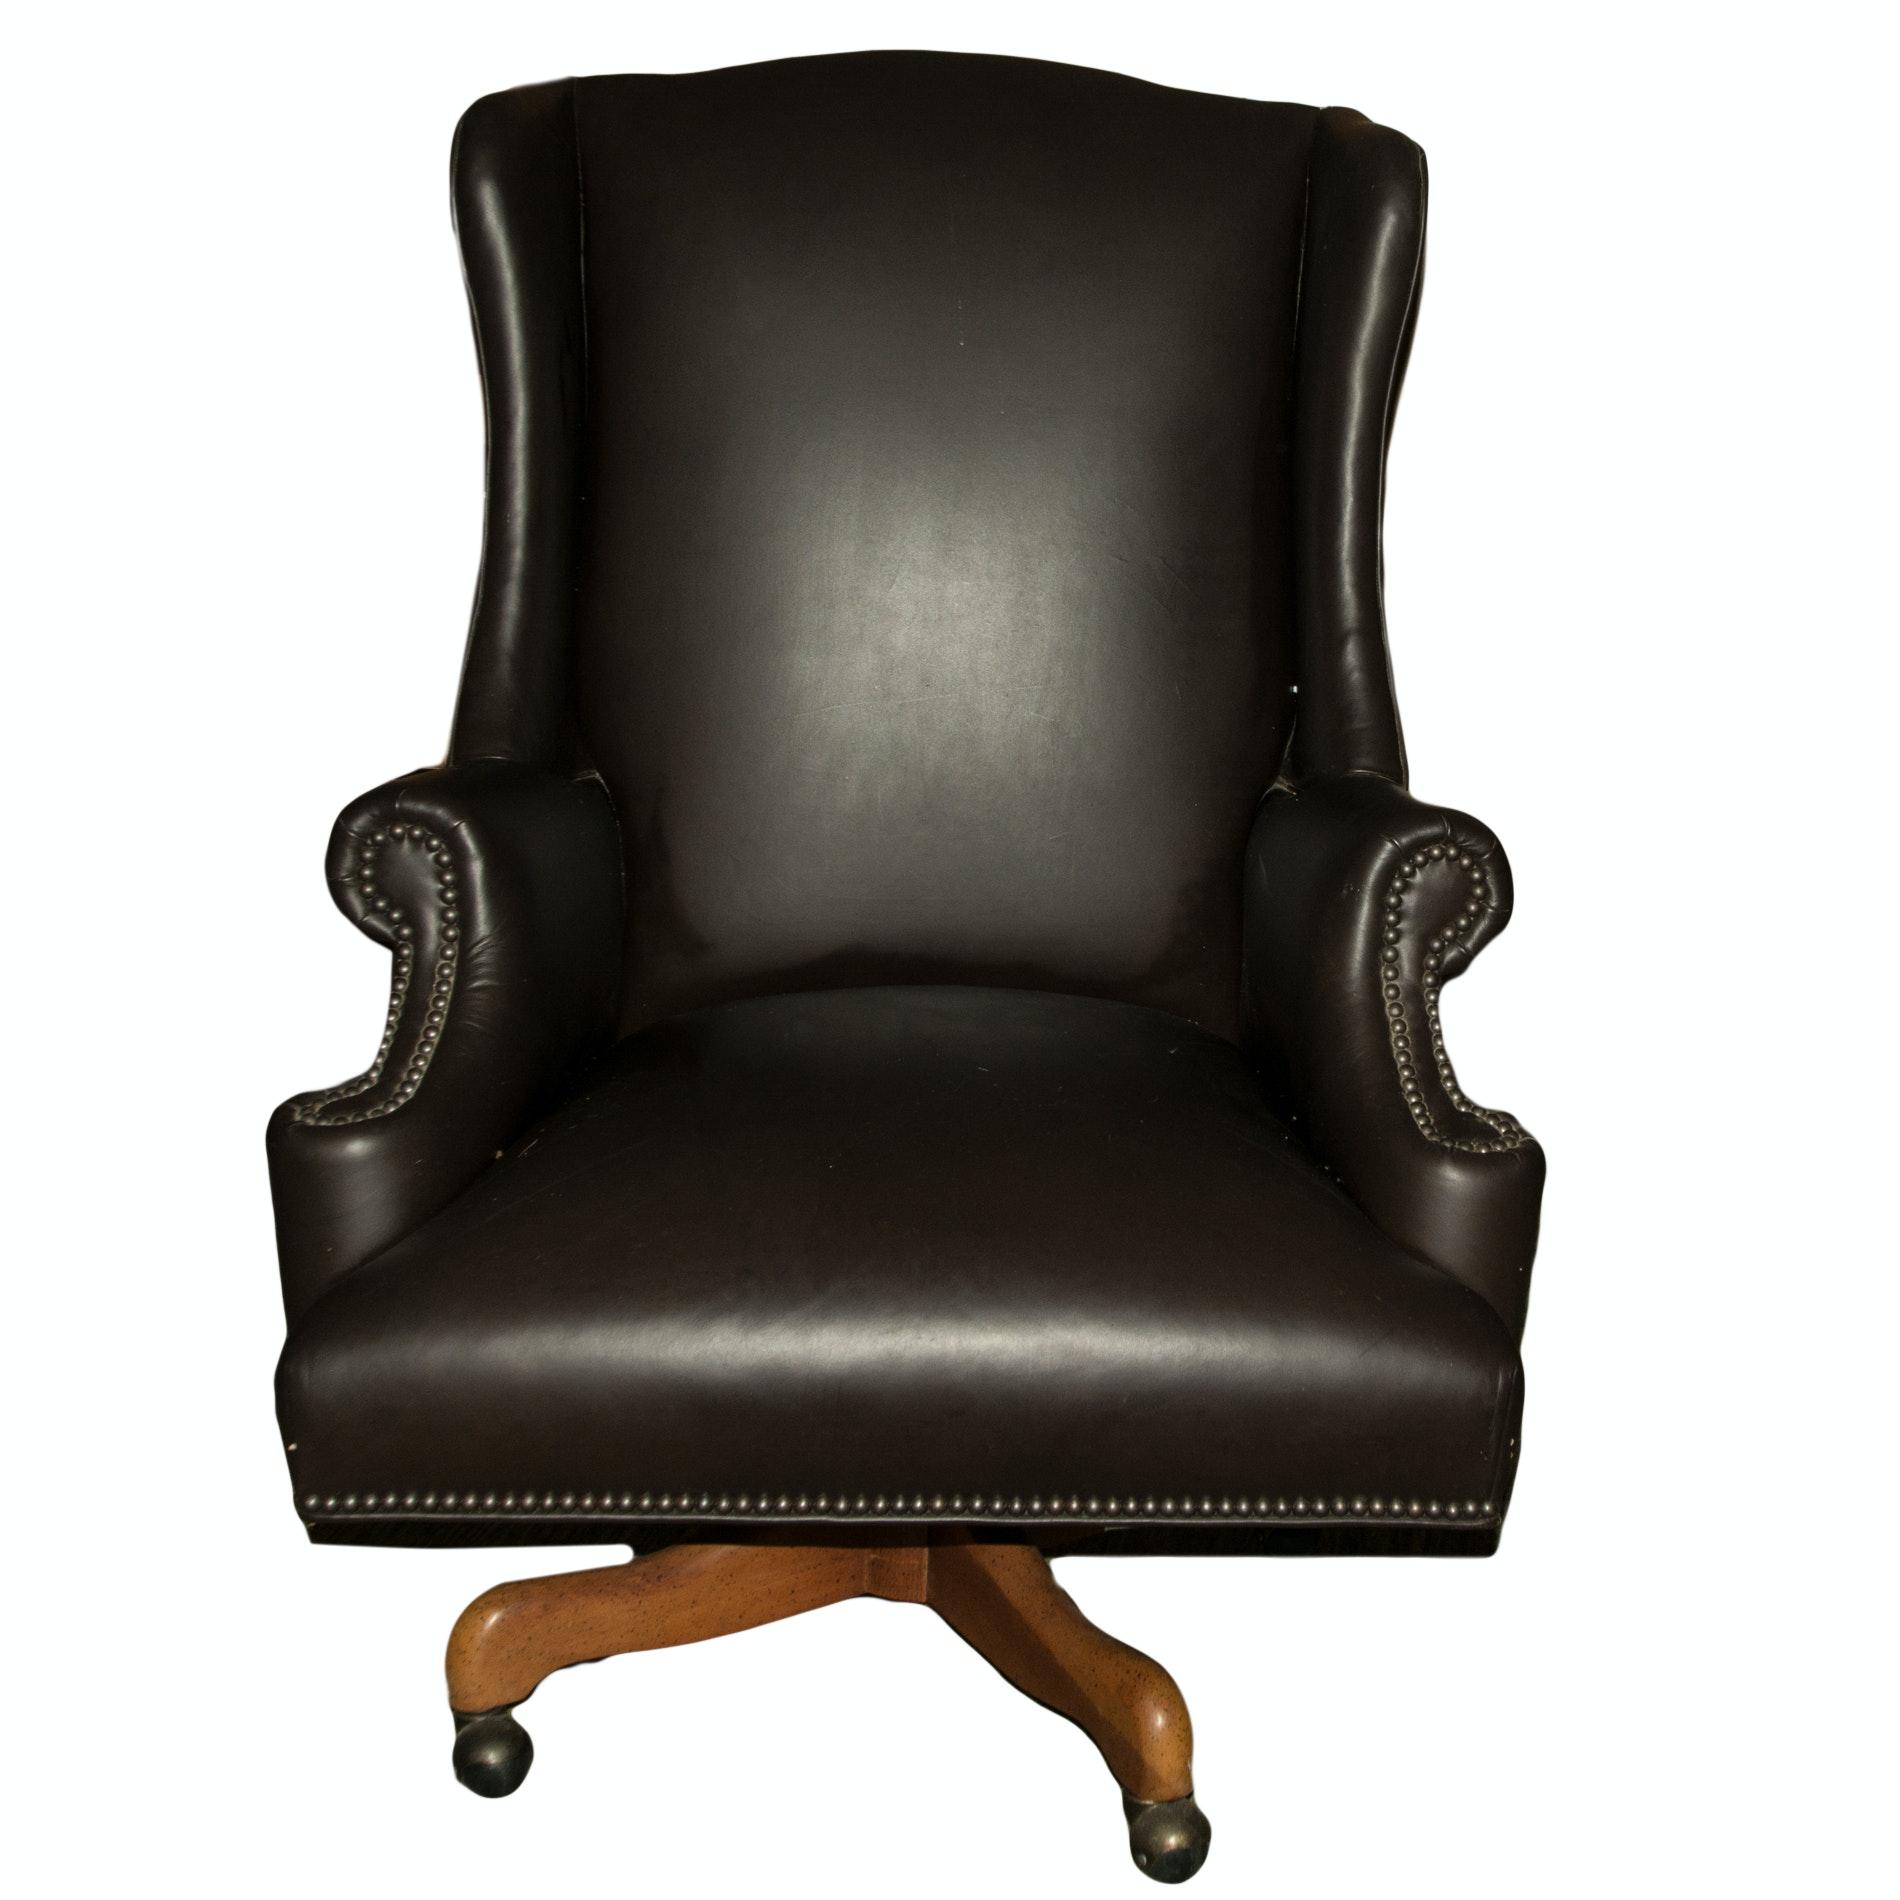 Vintage Wingback Desk Chair